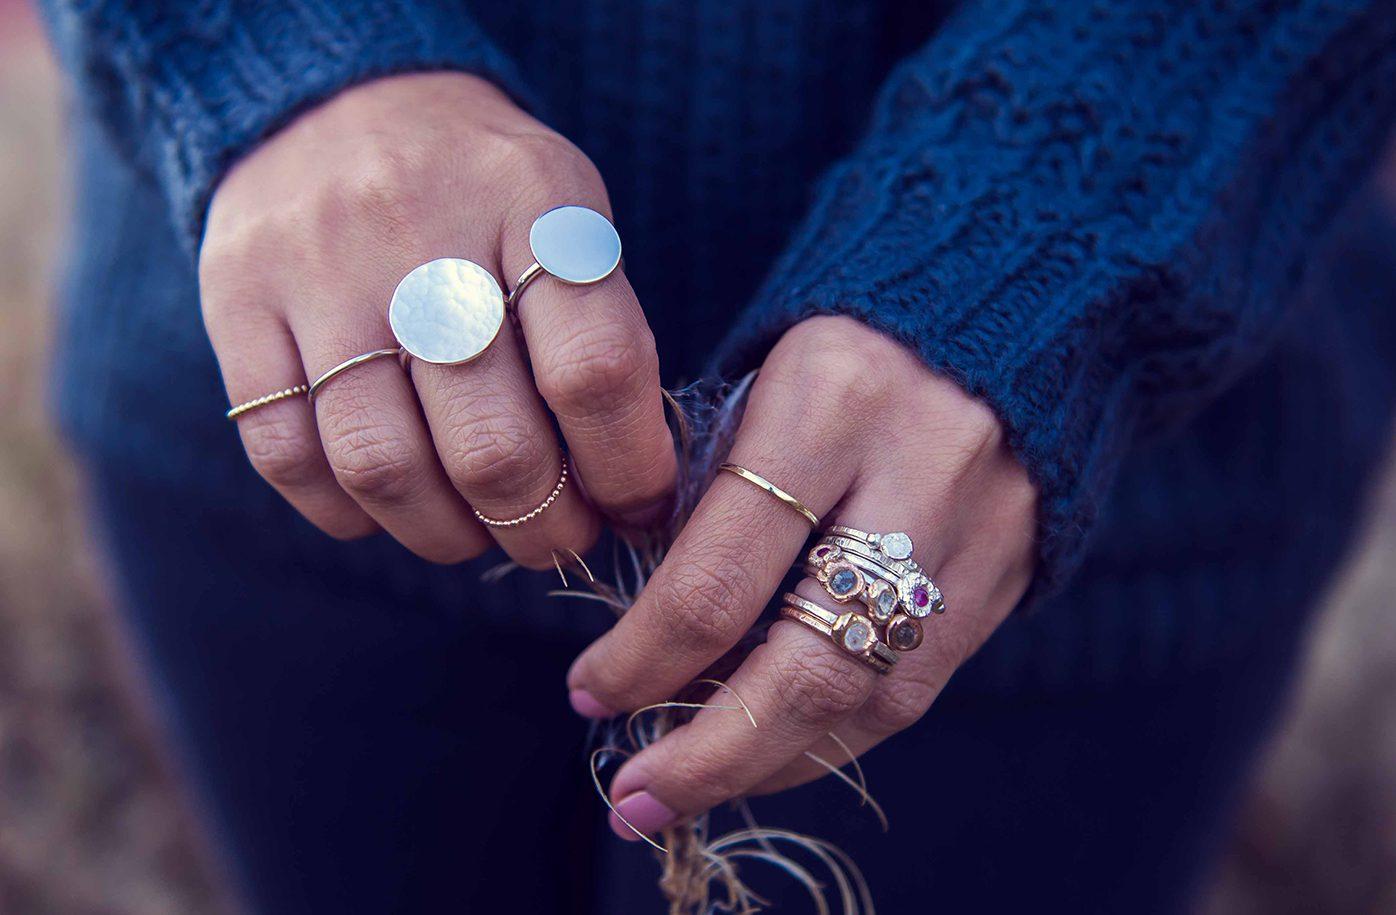 Angela-Georgiou-photography-rings